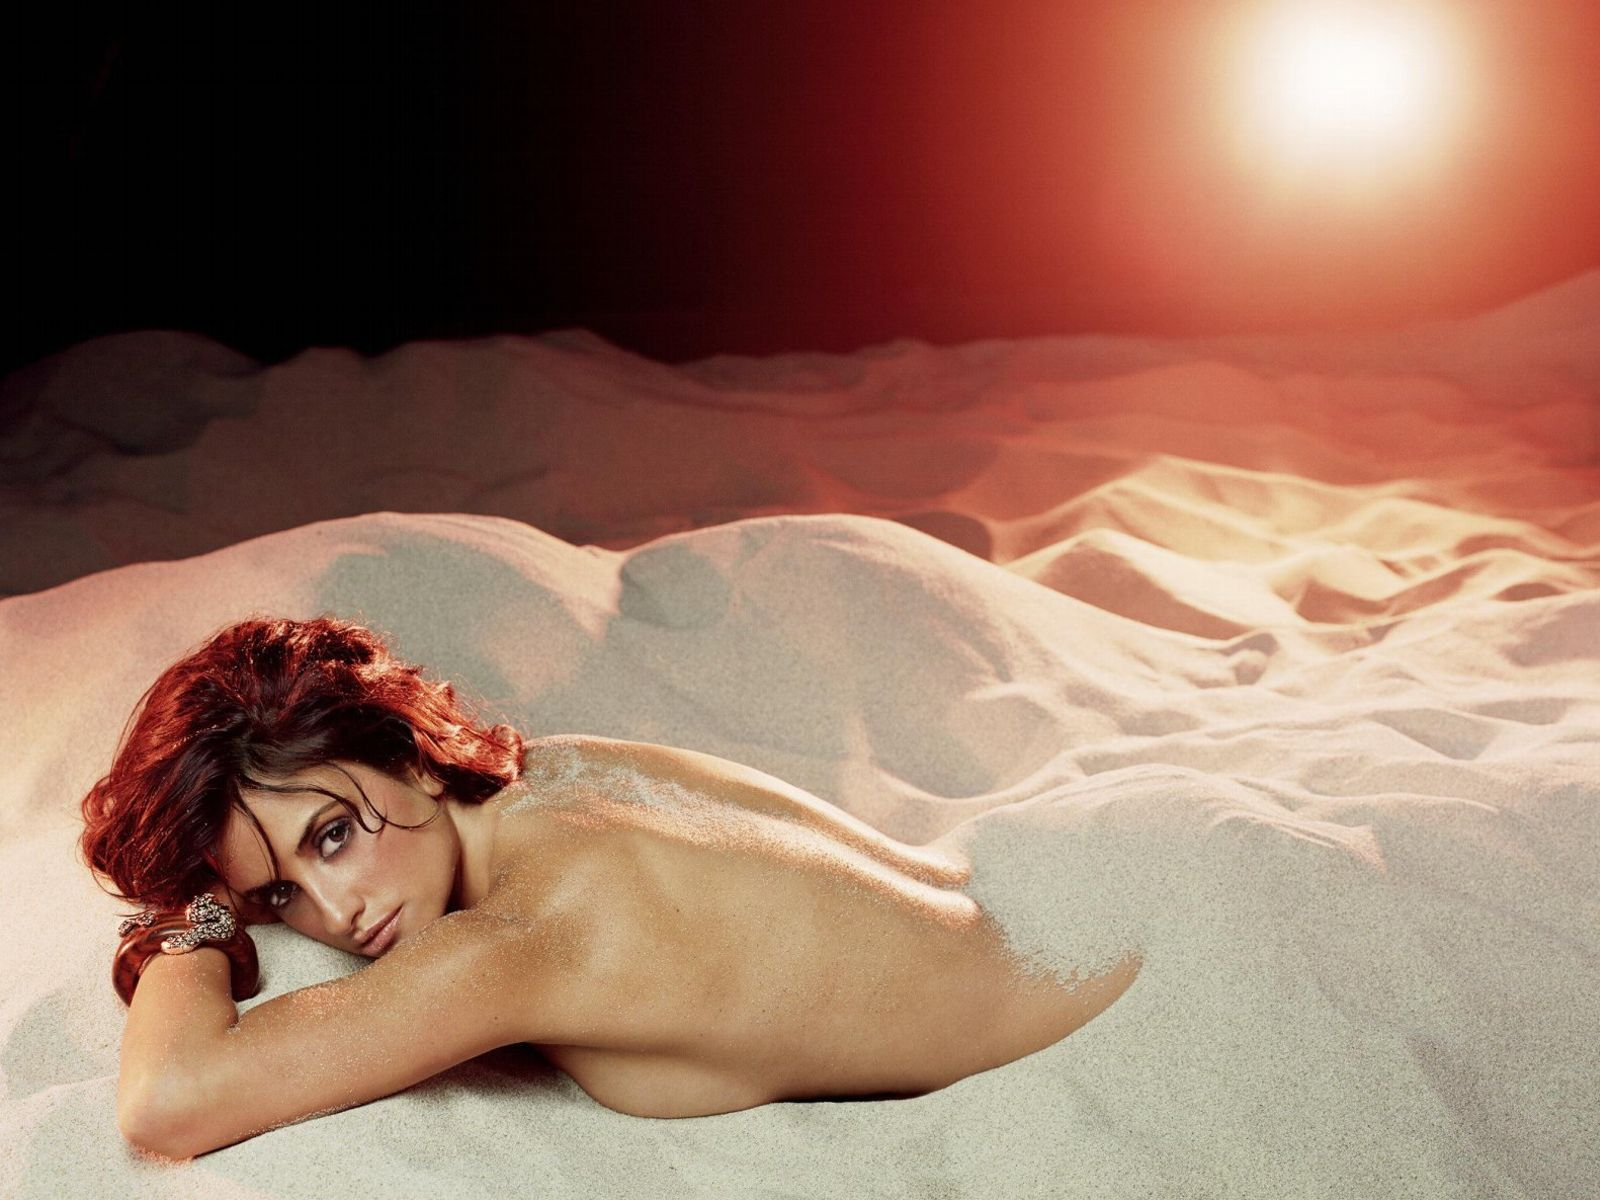 foto gratis penelope cruz desnuda: